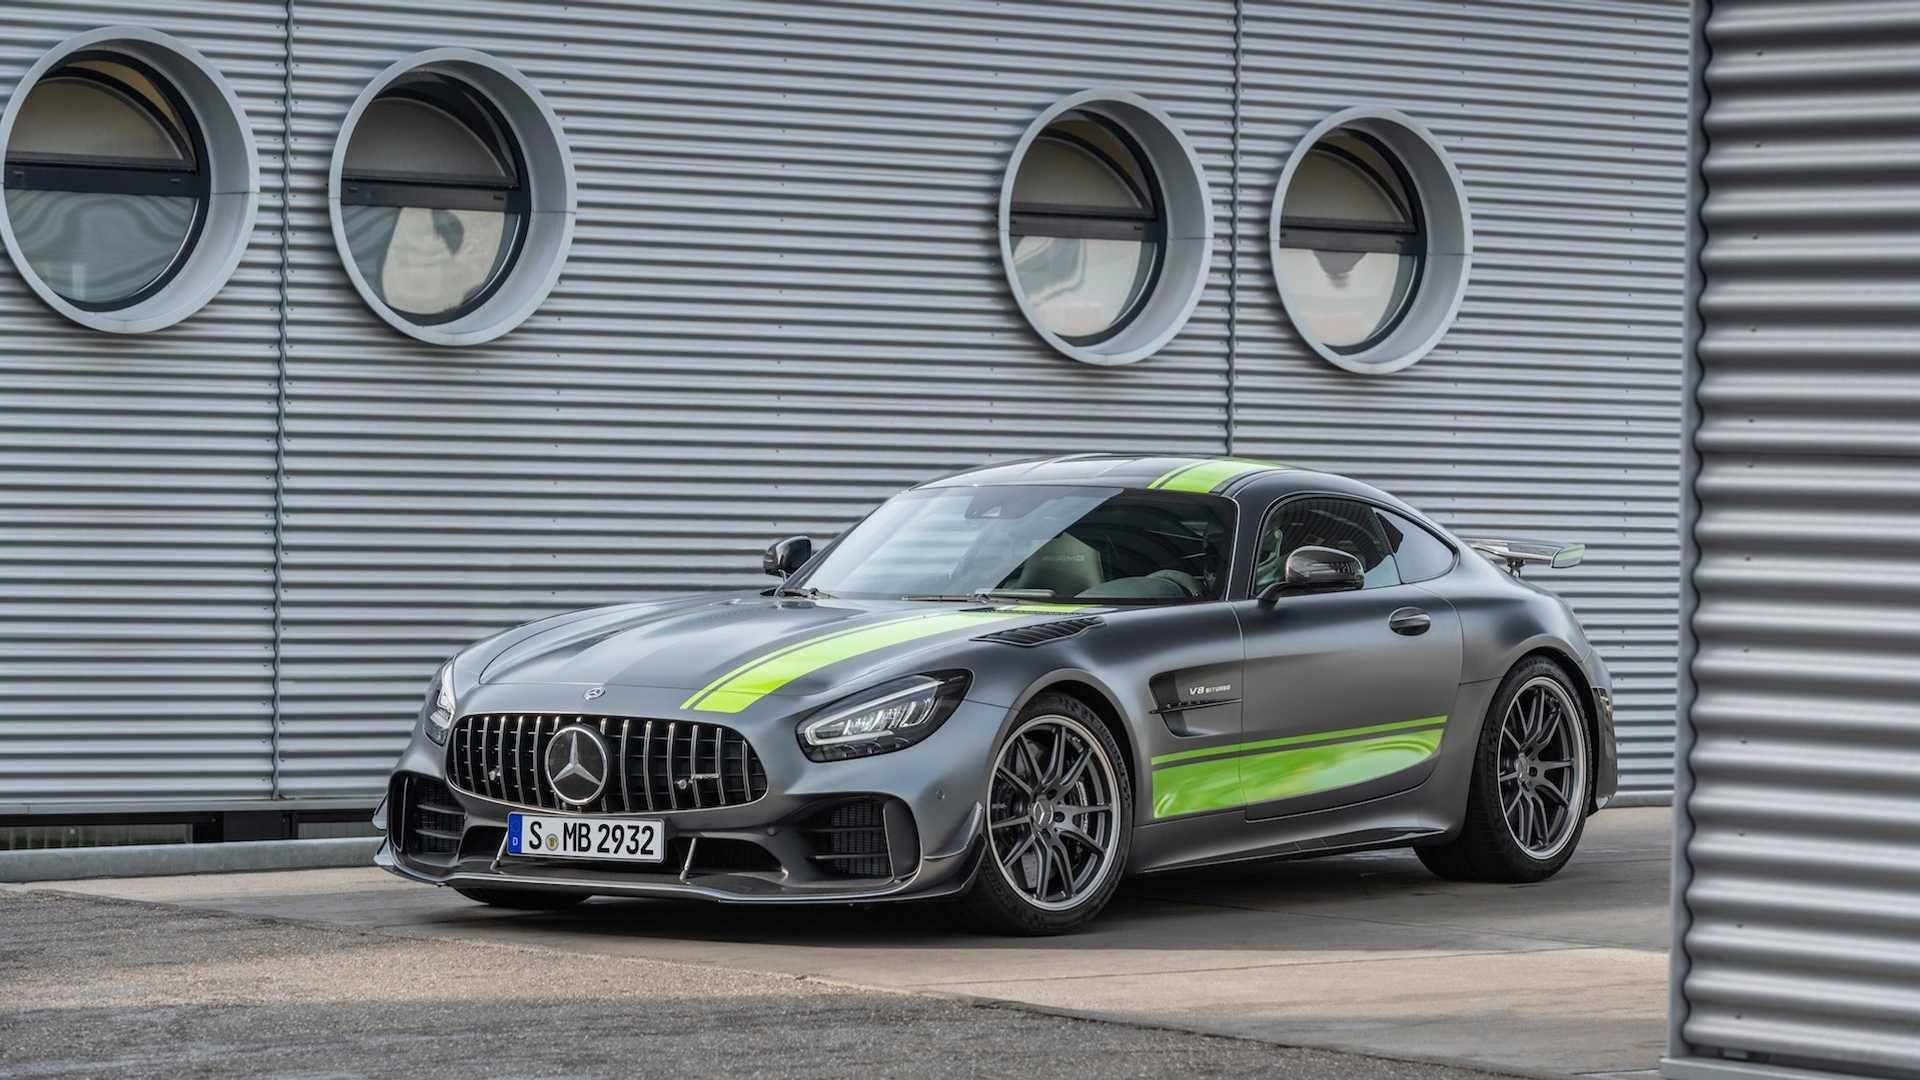 Mercedes-AMG ra mắt AMG GT R Pro tại Los Angeles Auto Show 2018 Ảnh 1